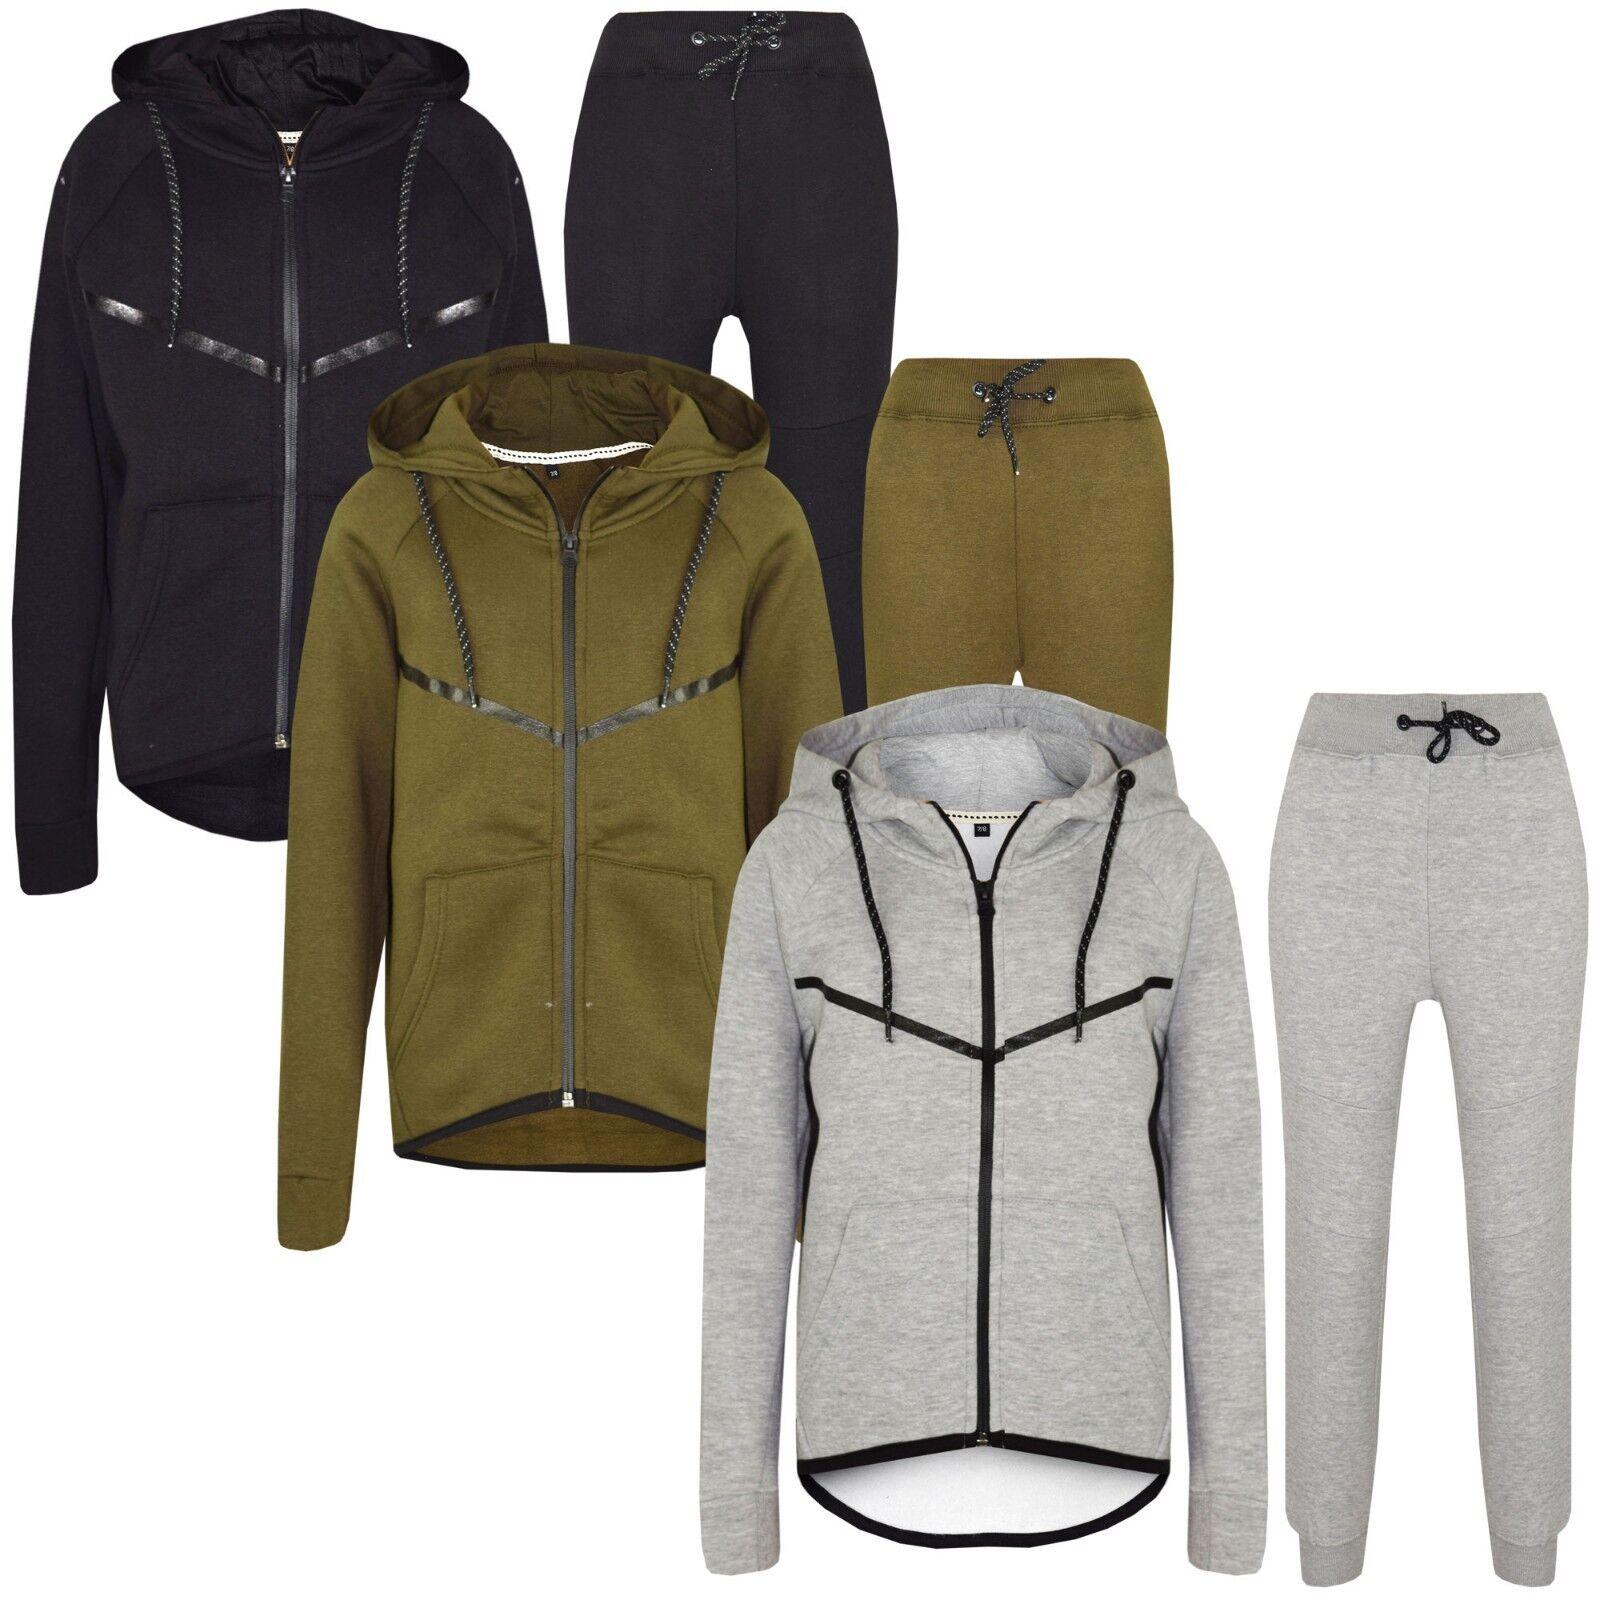 Jungen Slimfit Passform Kinder Mode Trainingsanzug Junior Fleece Jogginghose